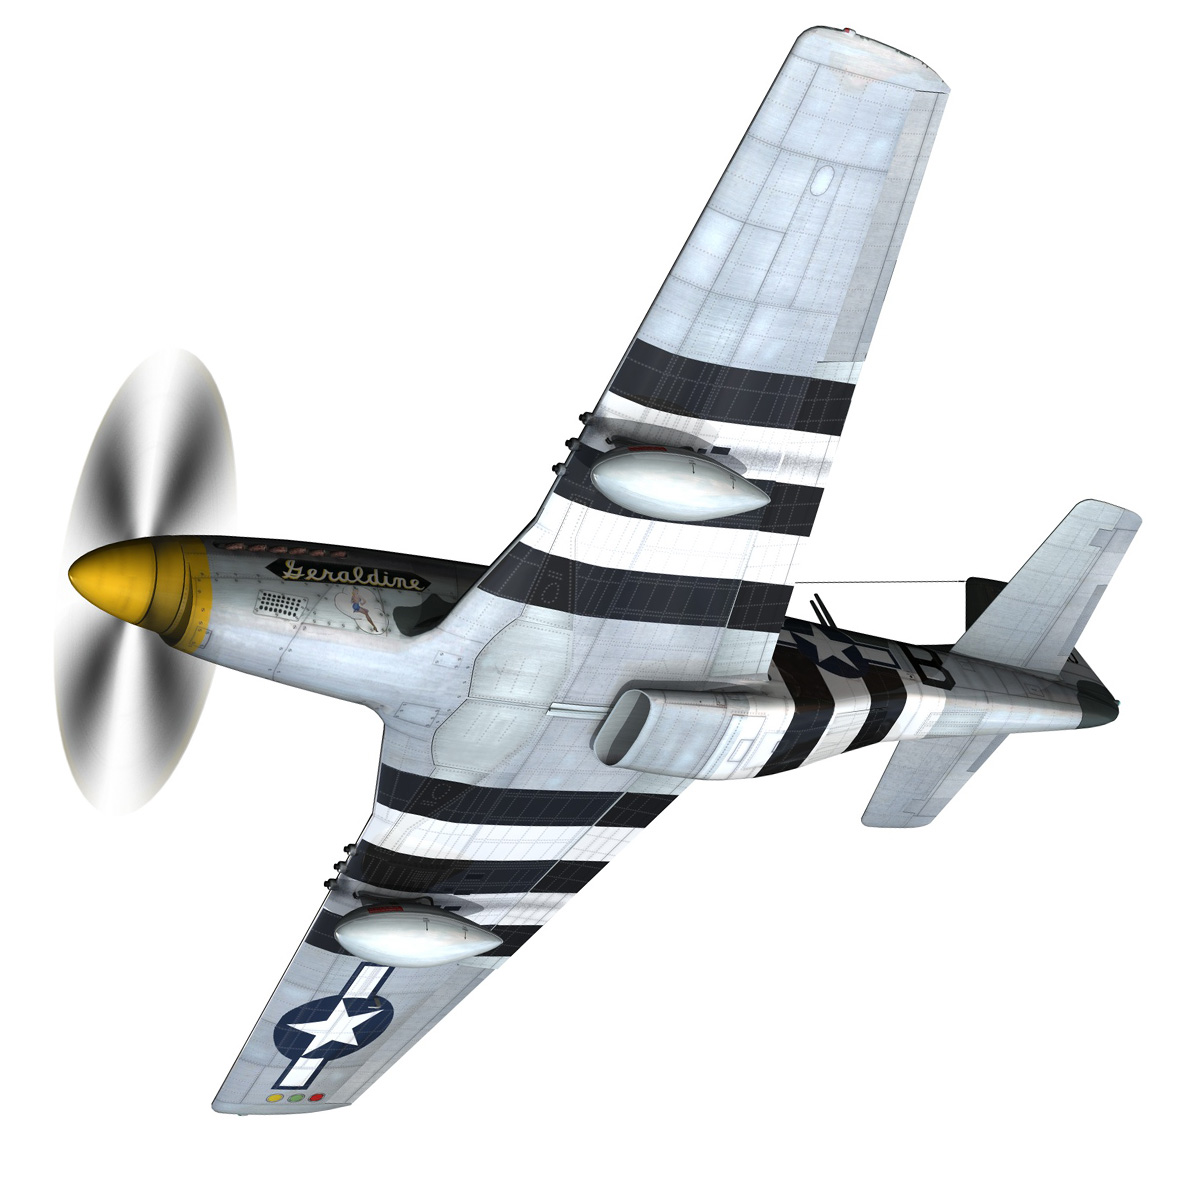 North American P-51D - Geraldine 3d model fbx c4d lwo obj 265939